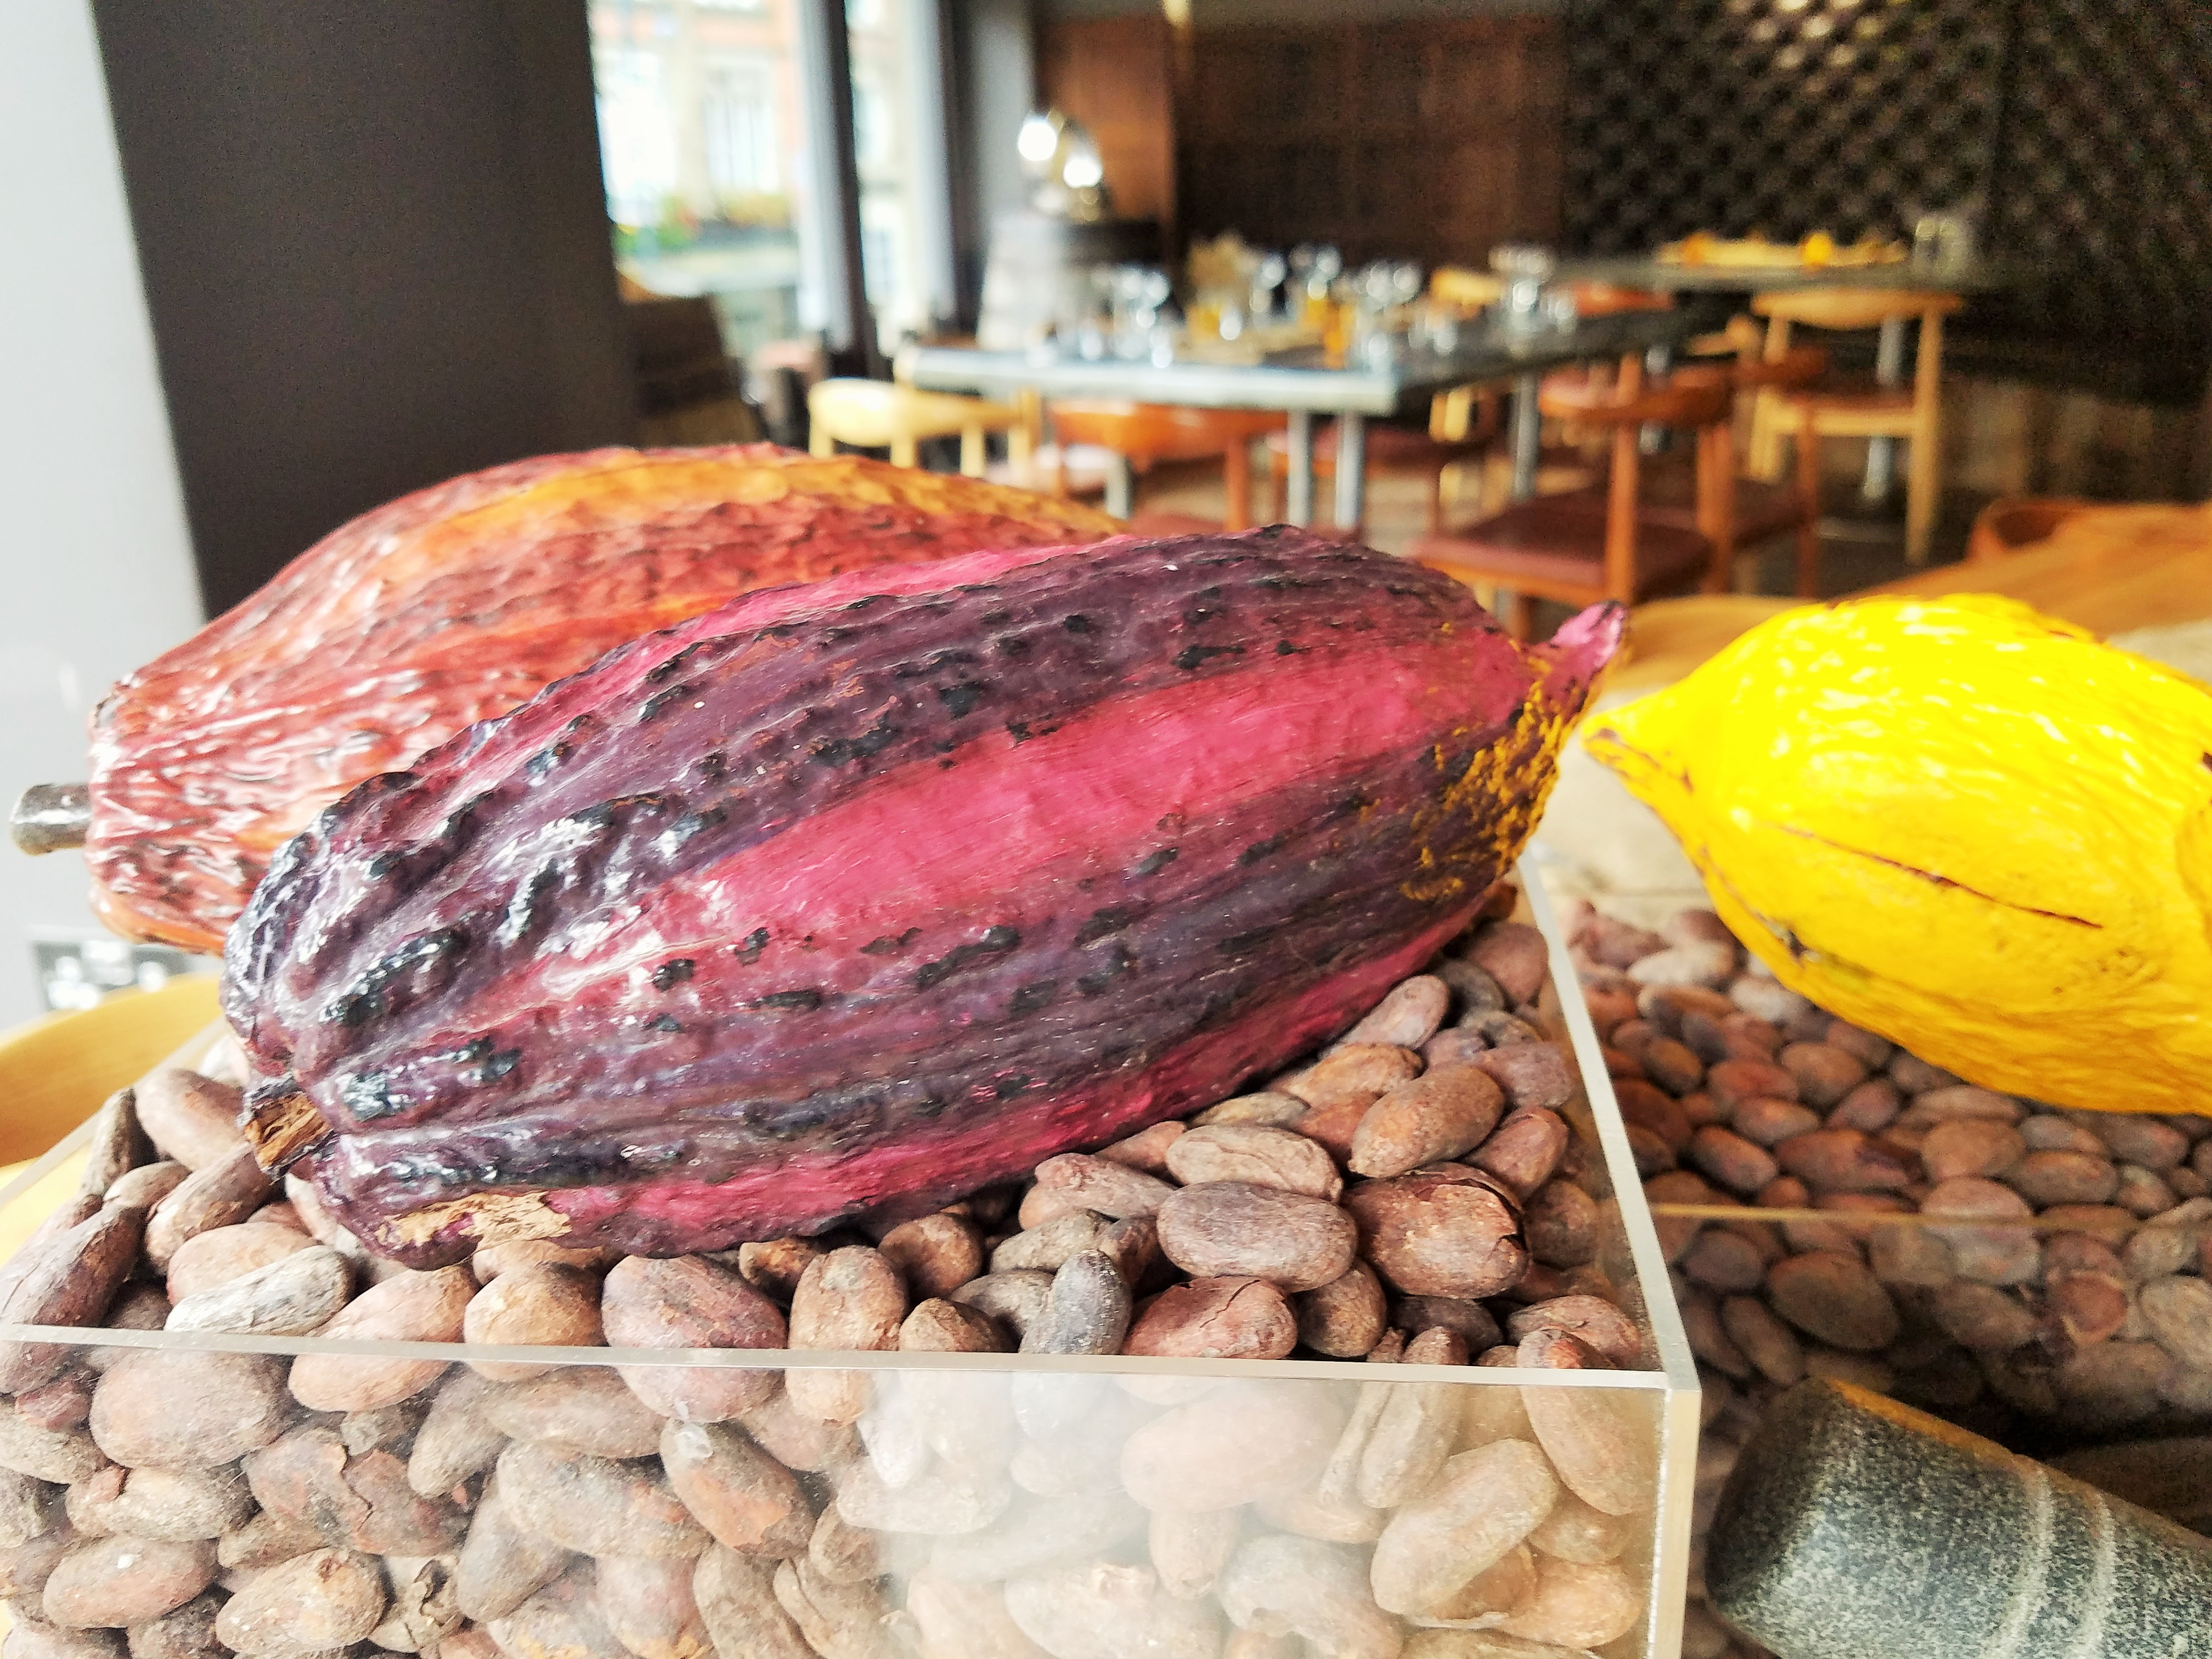 Hotel Chocolat Colourful cocoa pods